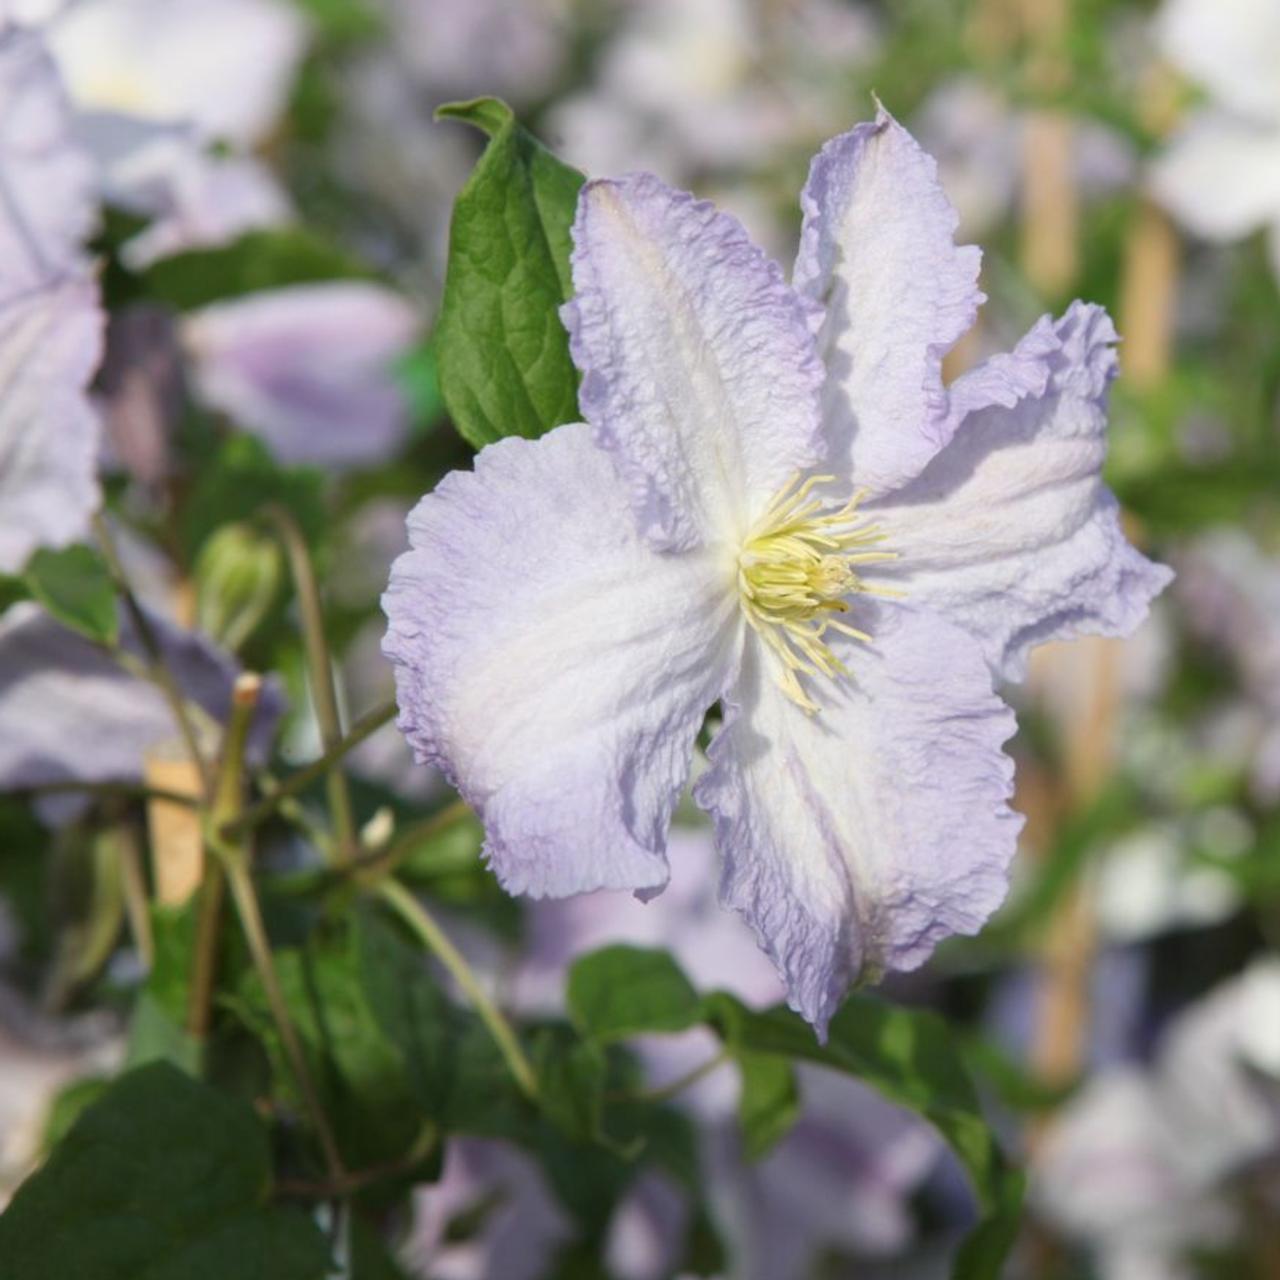 Clematis 'Blekitny aniol' plant